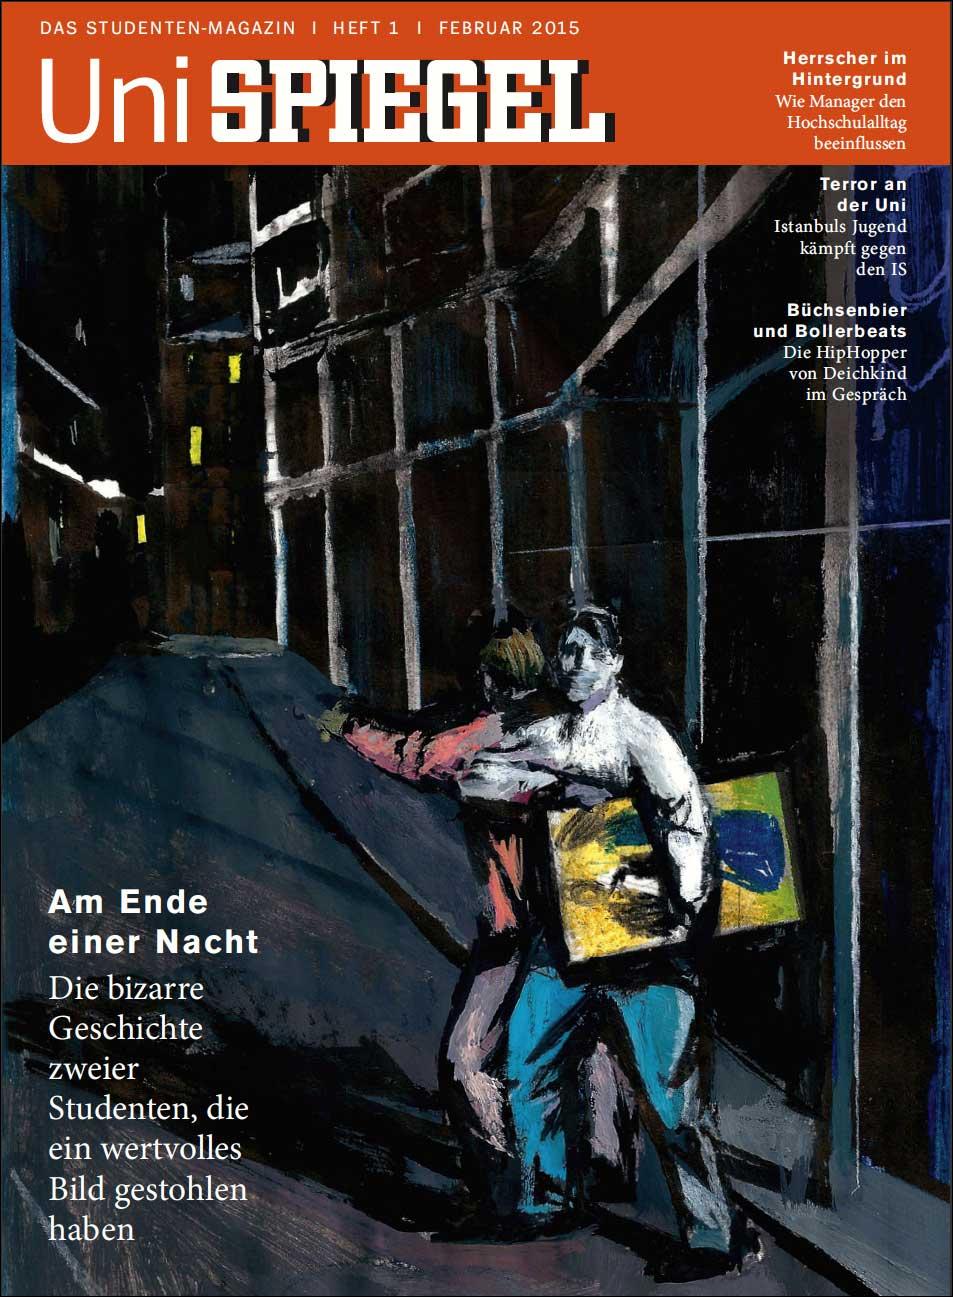 Illustration: Wie immer malerisch – Andrea Ventura, http://www.andreaventuraart.com/